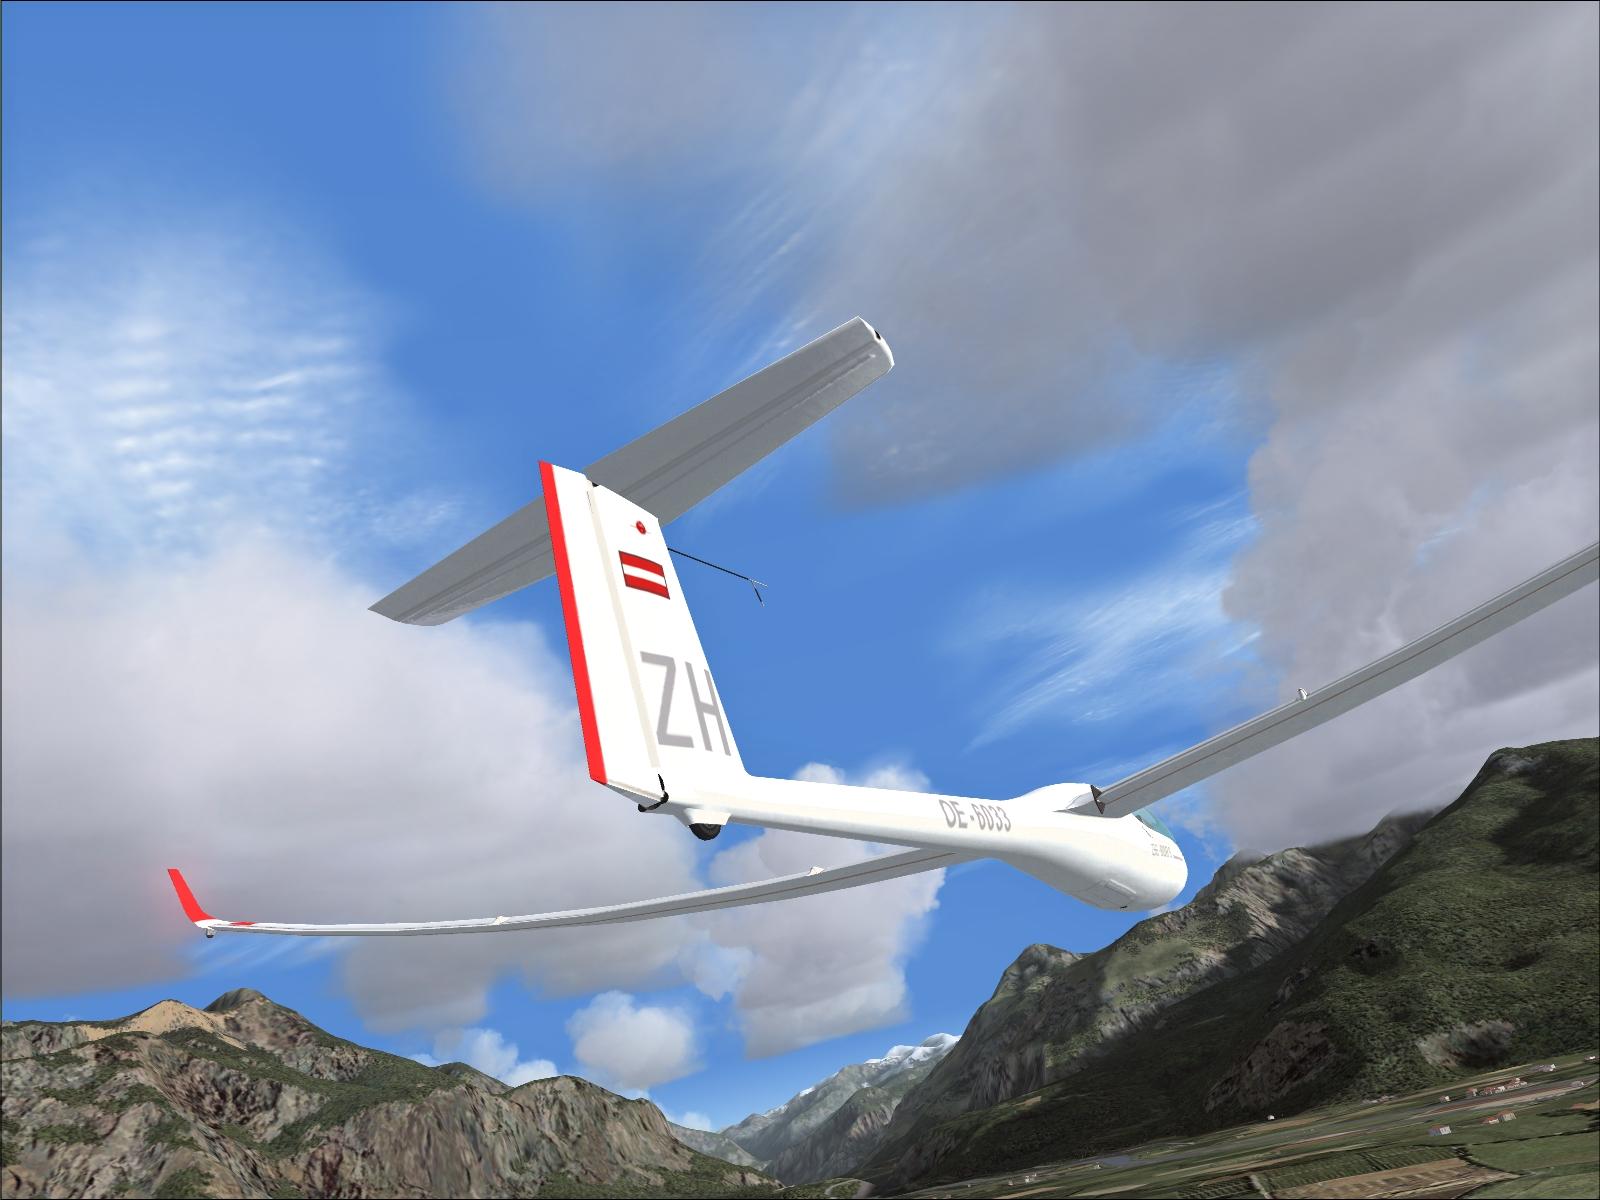 Microsoft Flight Simulator X video game wallpapers Wallpaper 23 of 1600x1200